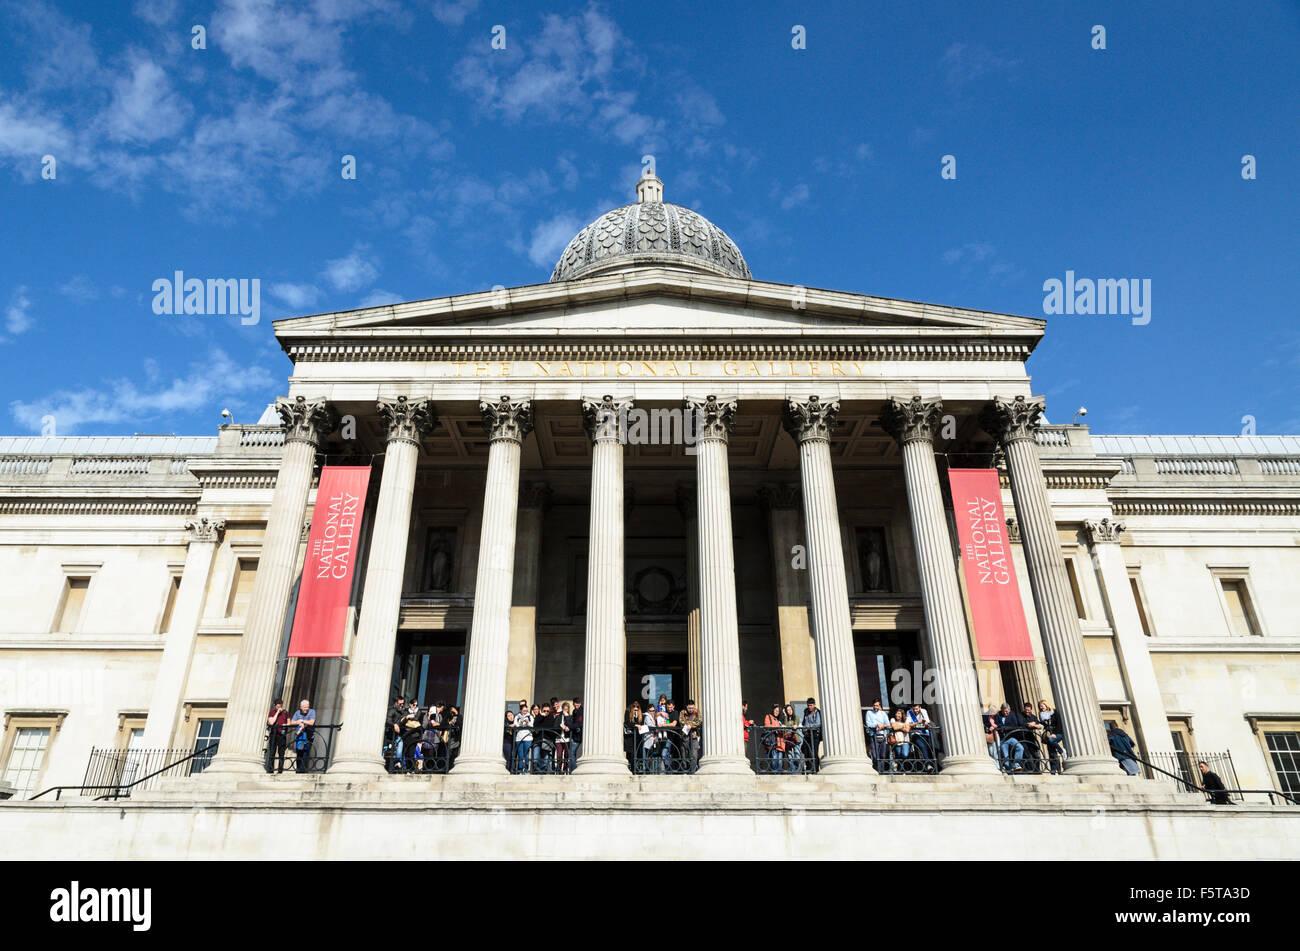 Tourists crowd the balcony of The National Gallery, Trafalgar Square, London, England, UK. Stock Photo